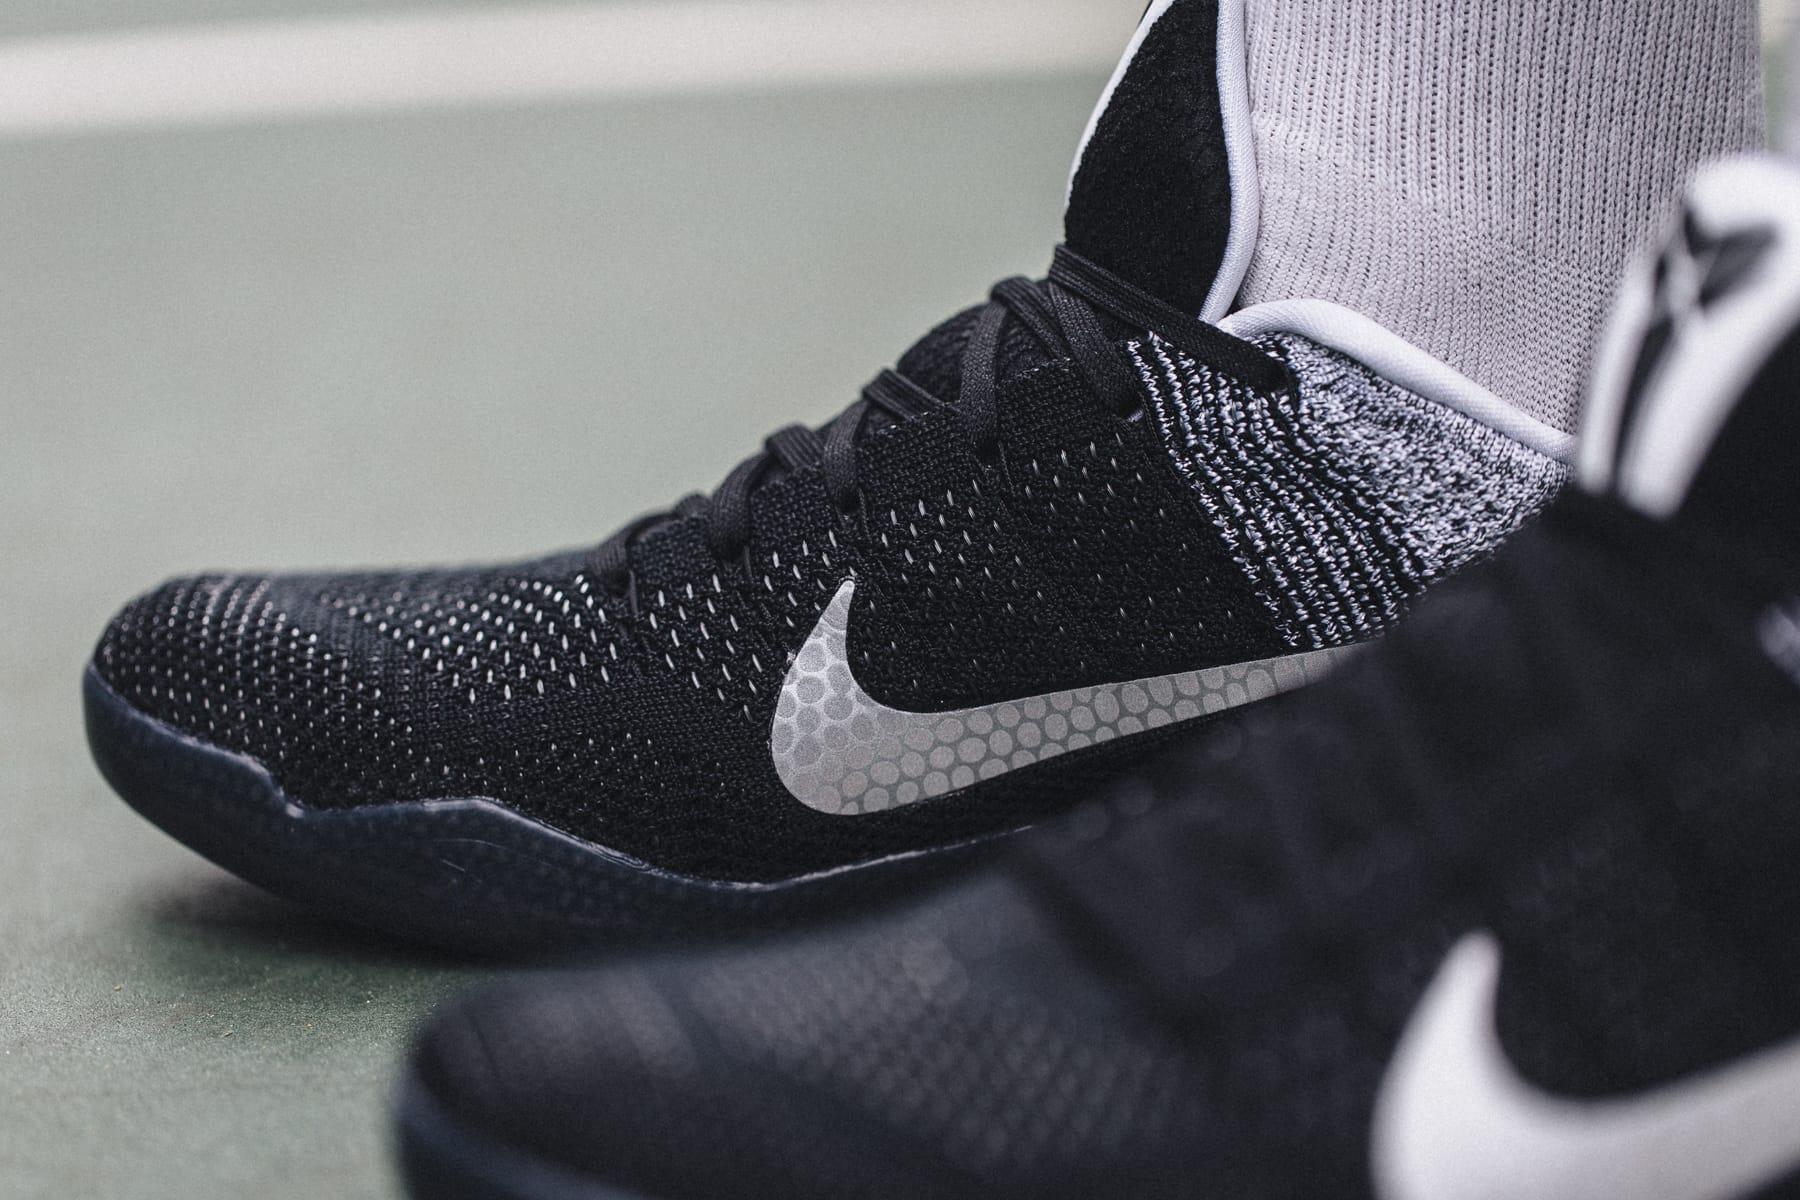 Aesthetic Nike Kobe 9 Elite Black - Musée des impressionnismes Giverny